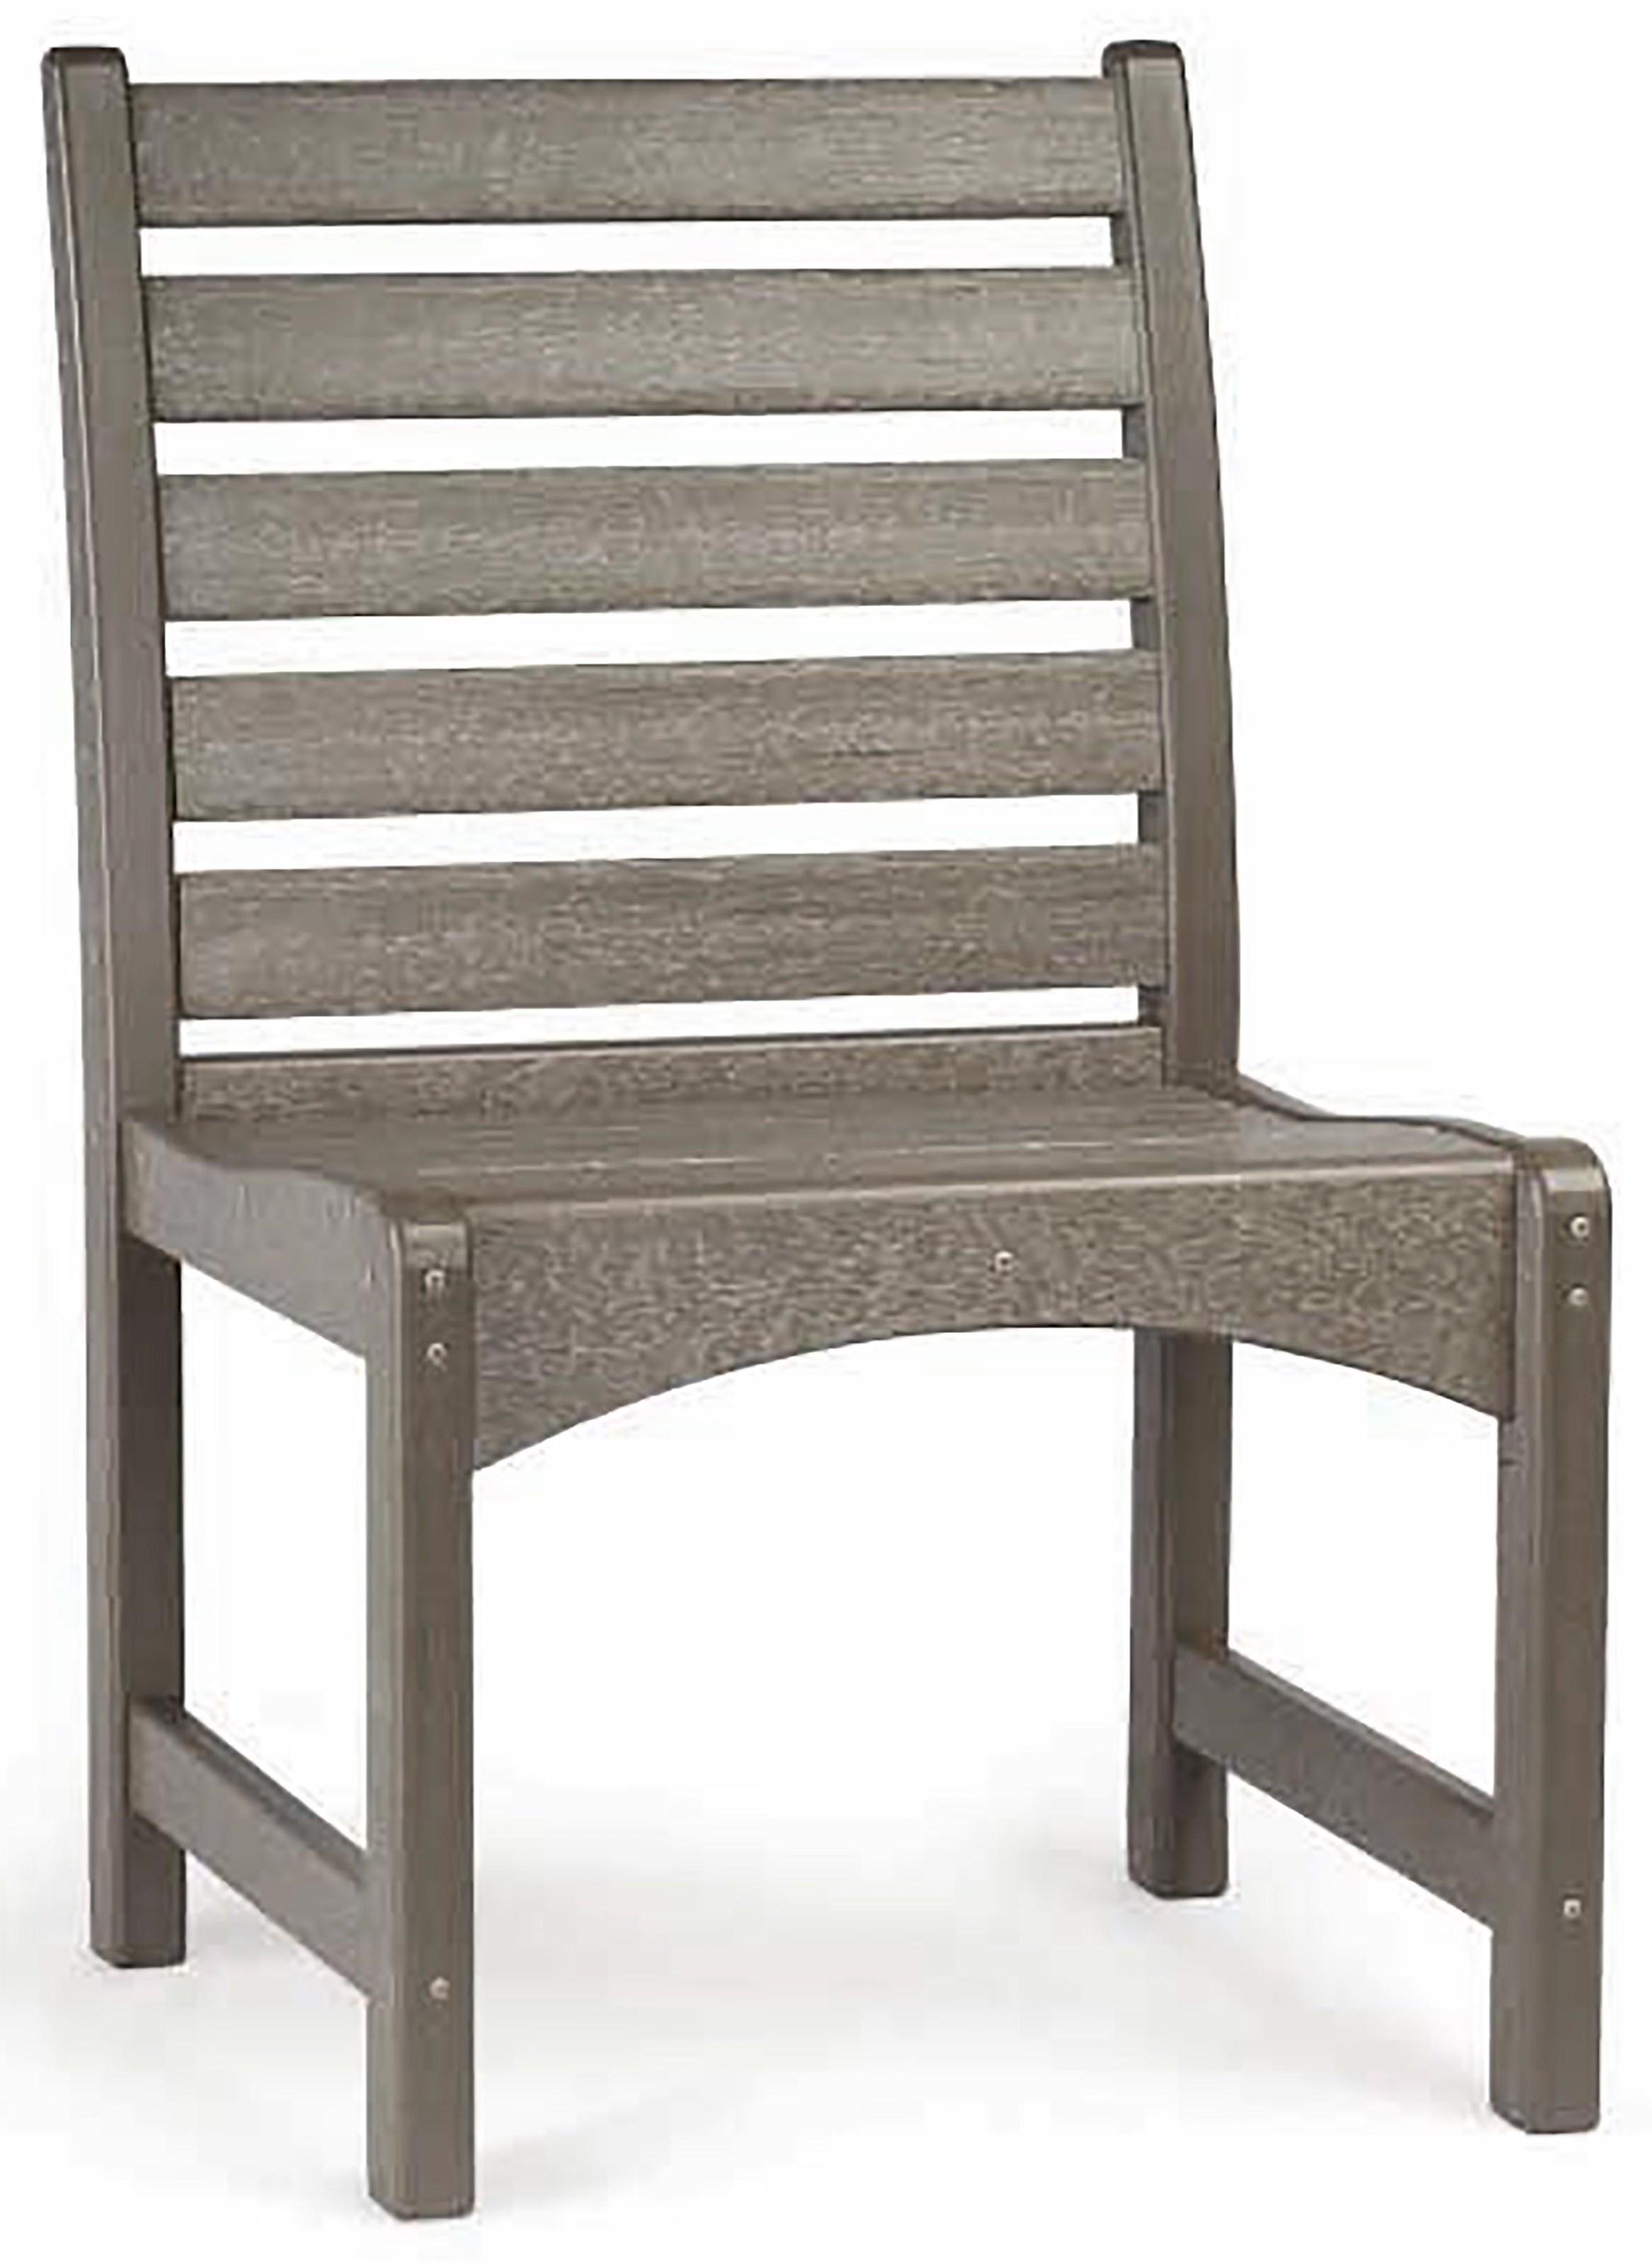 Piedmont Piedmont Side Chair by Breezesta at Johnny Janosik